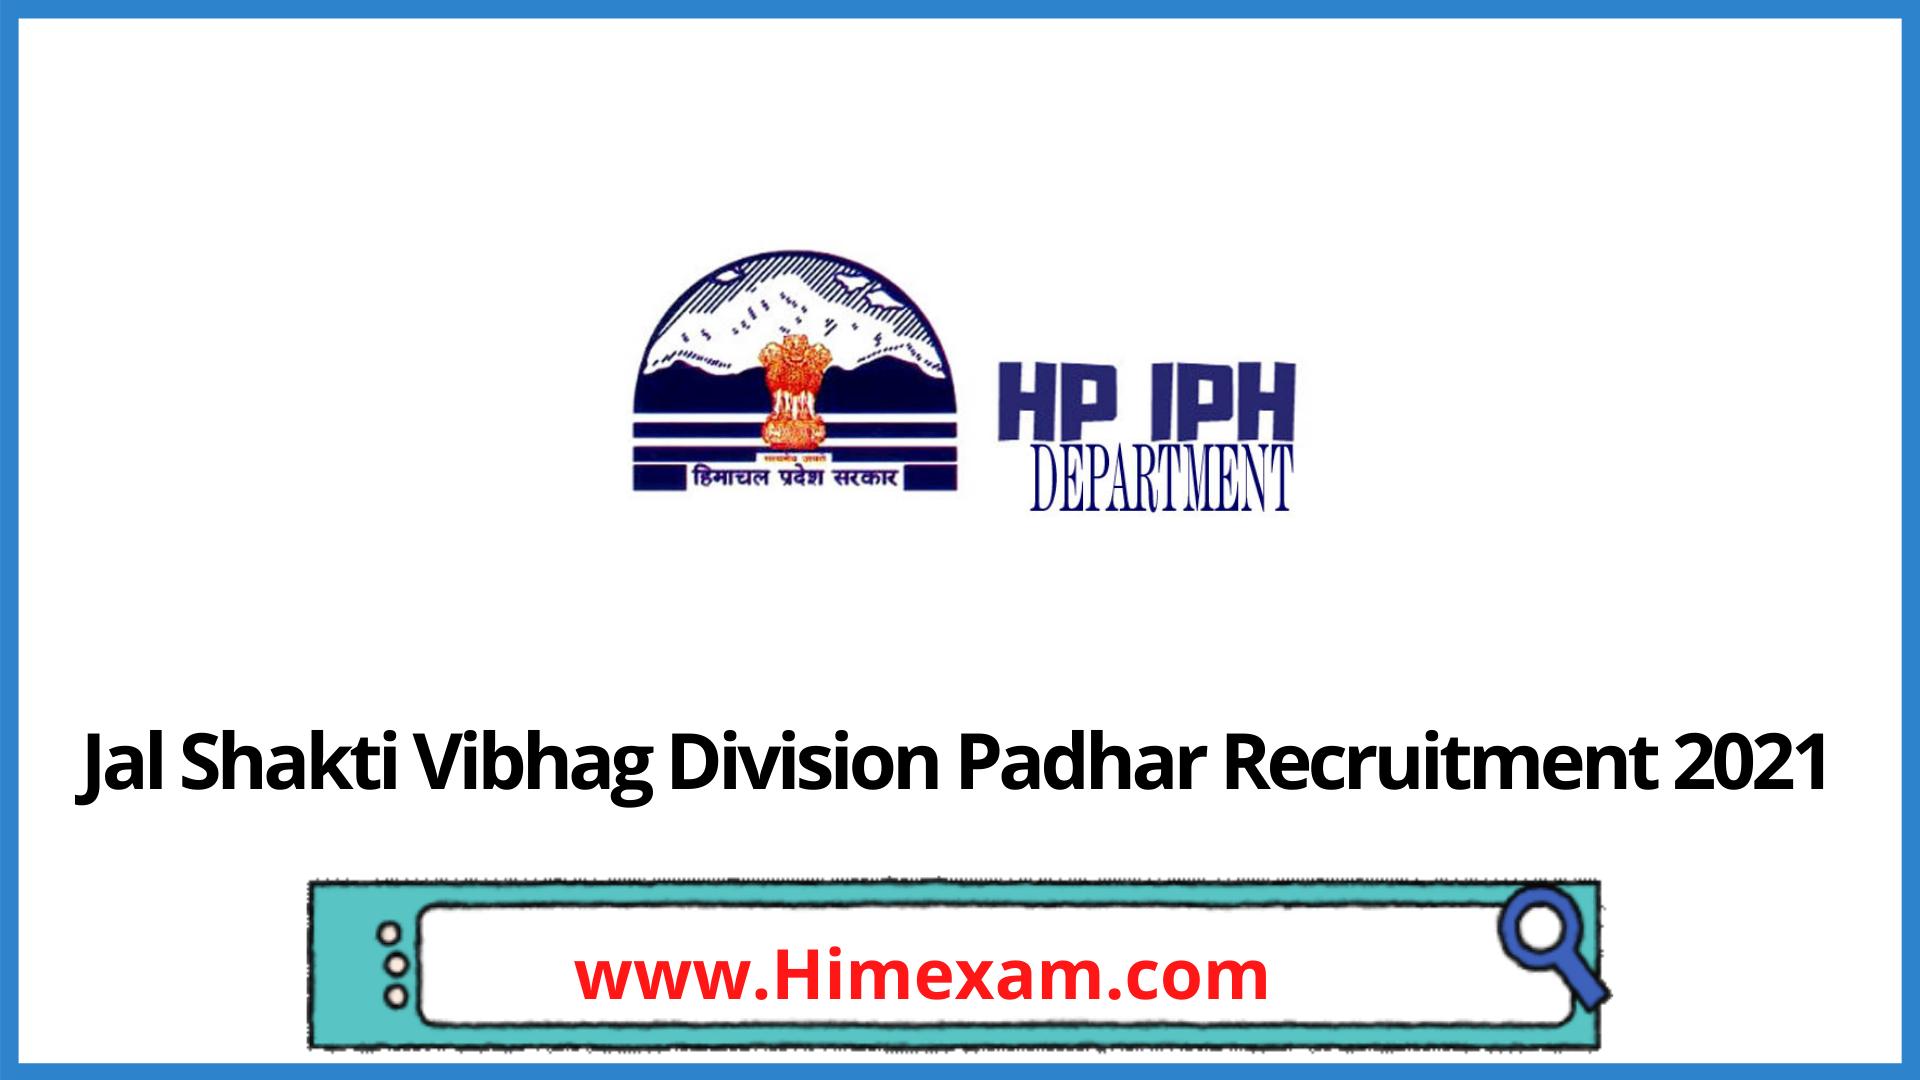 Jal Shakti Vibhag Division Padhar Recruitment 2021